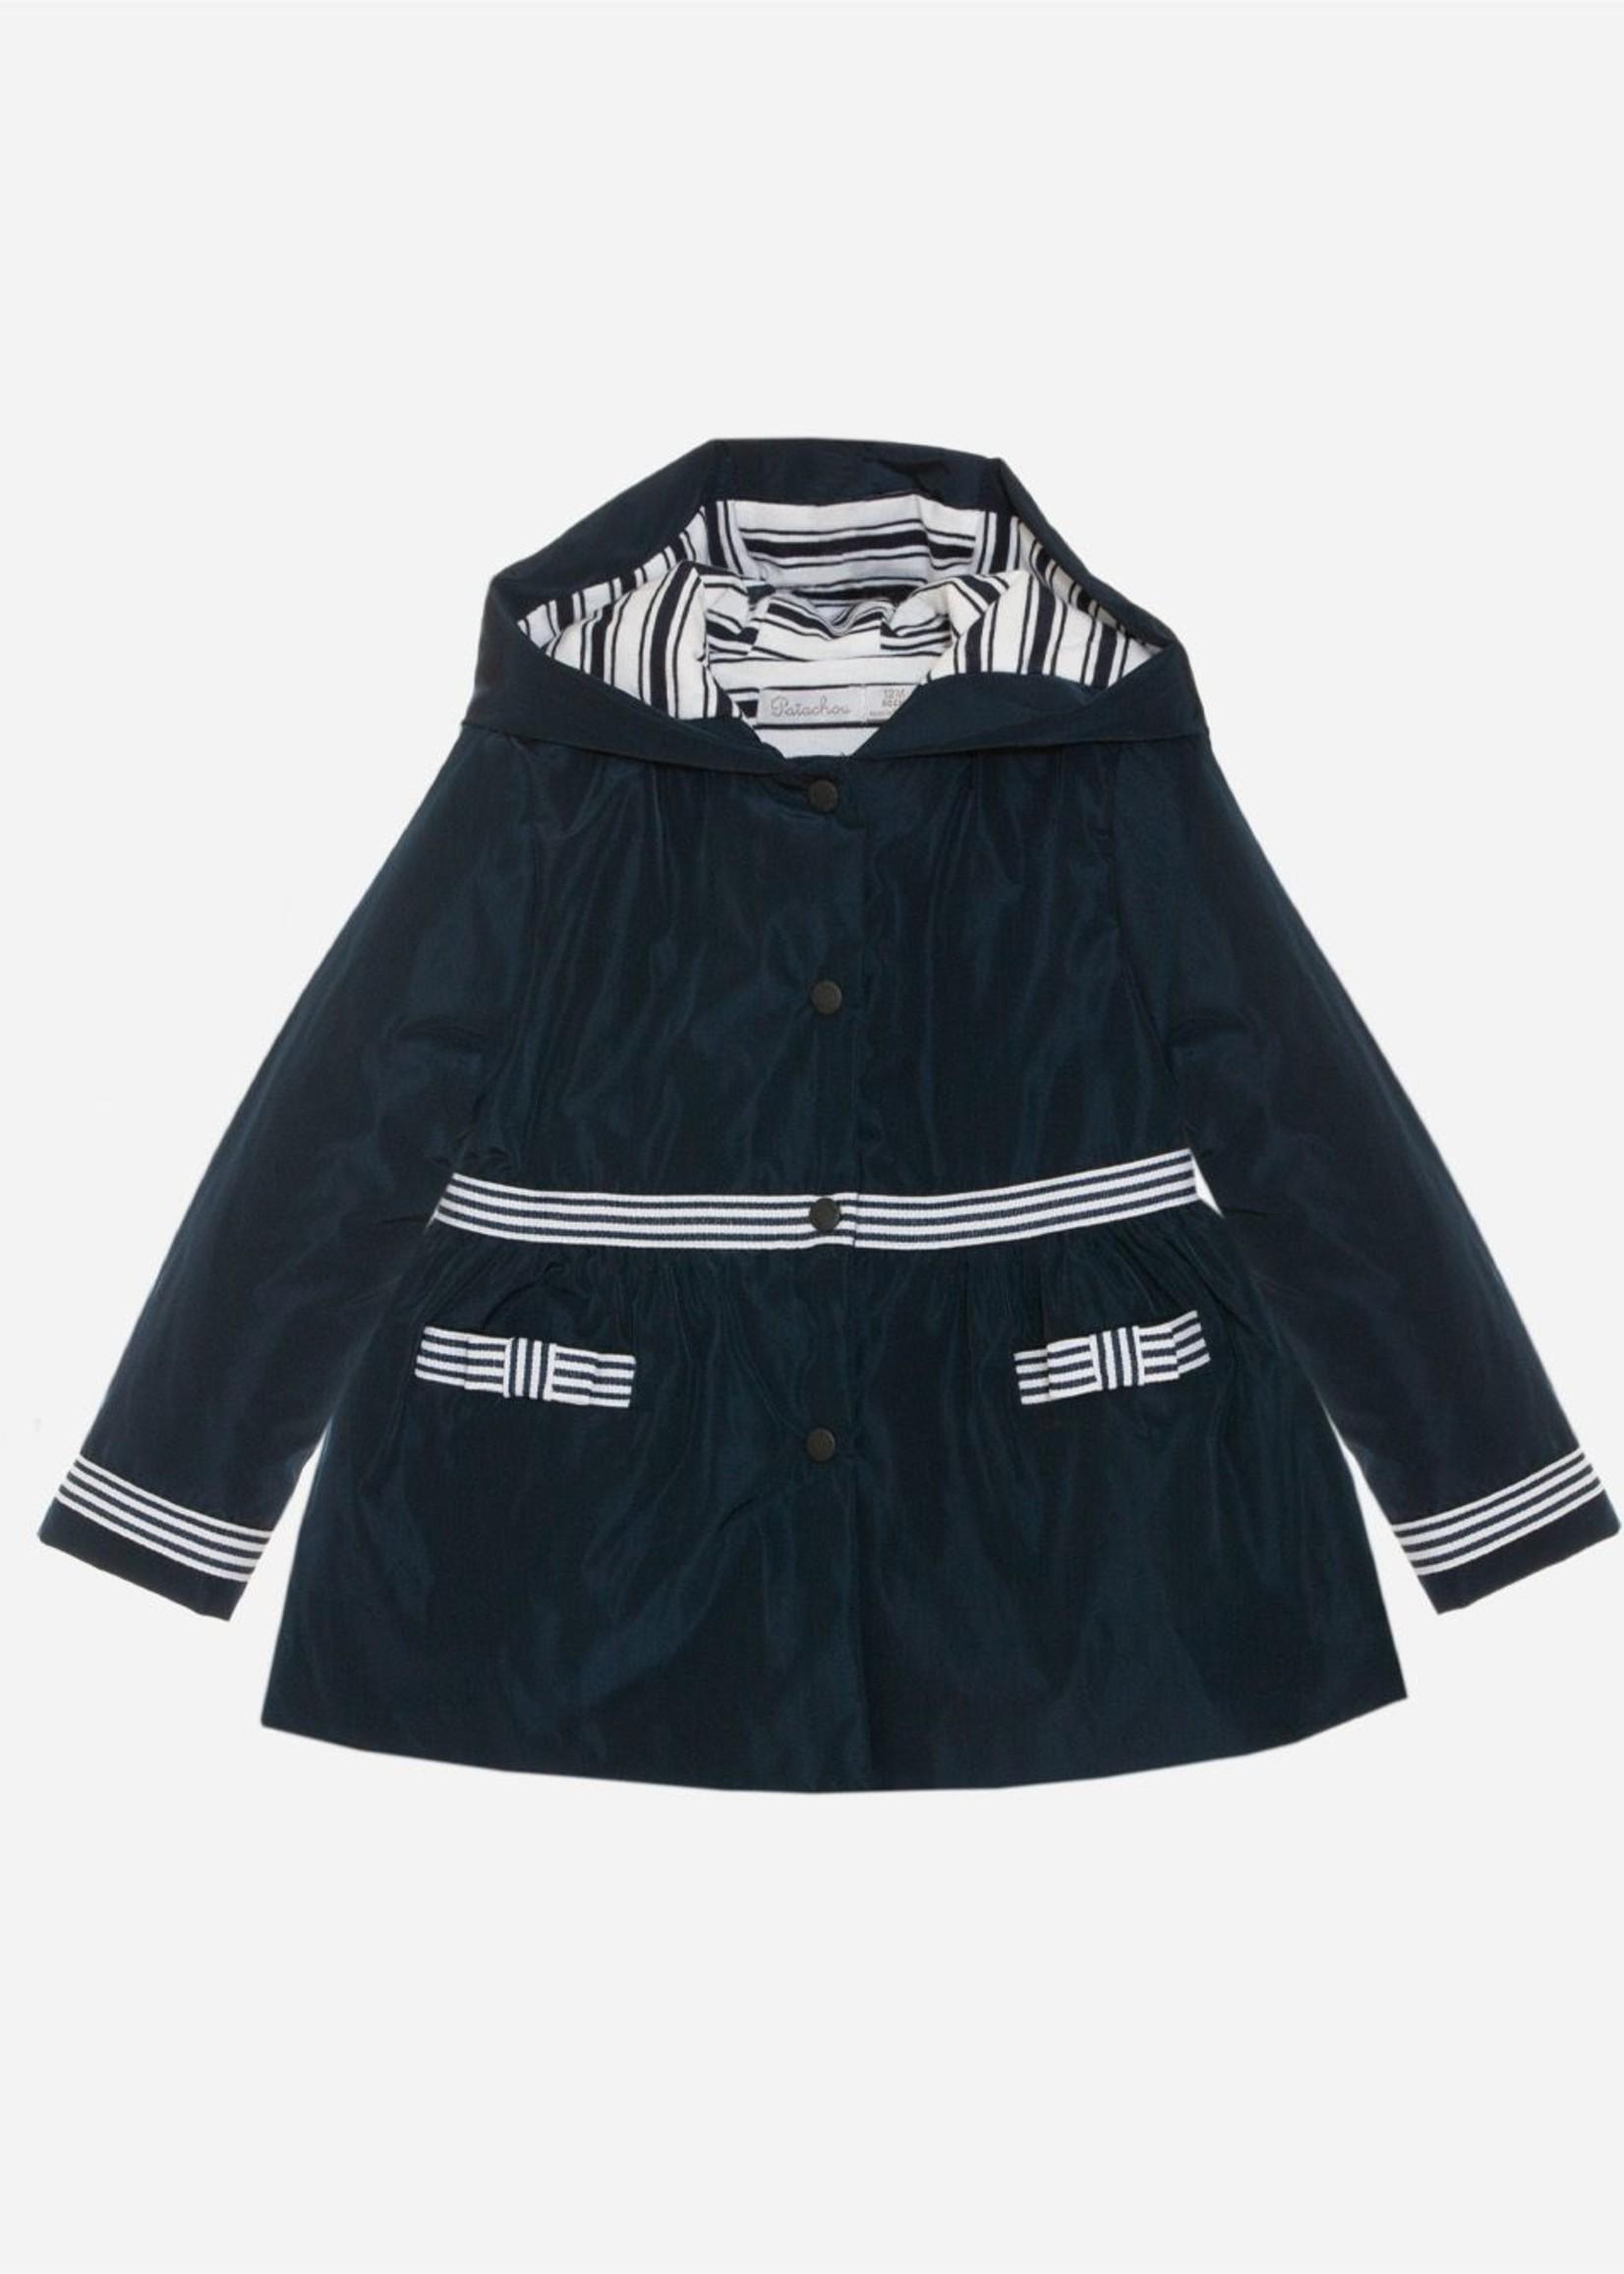 Patachou Patachou-ss21 3233240 Jacket